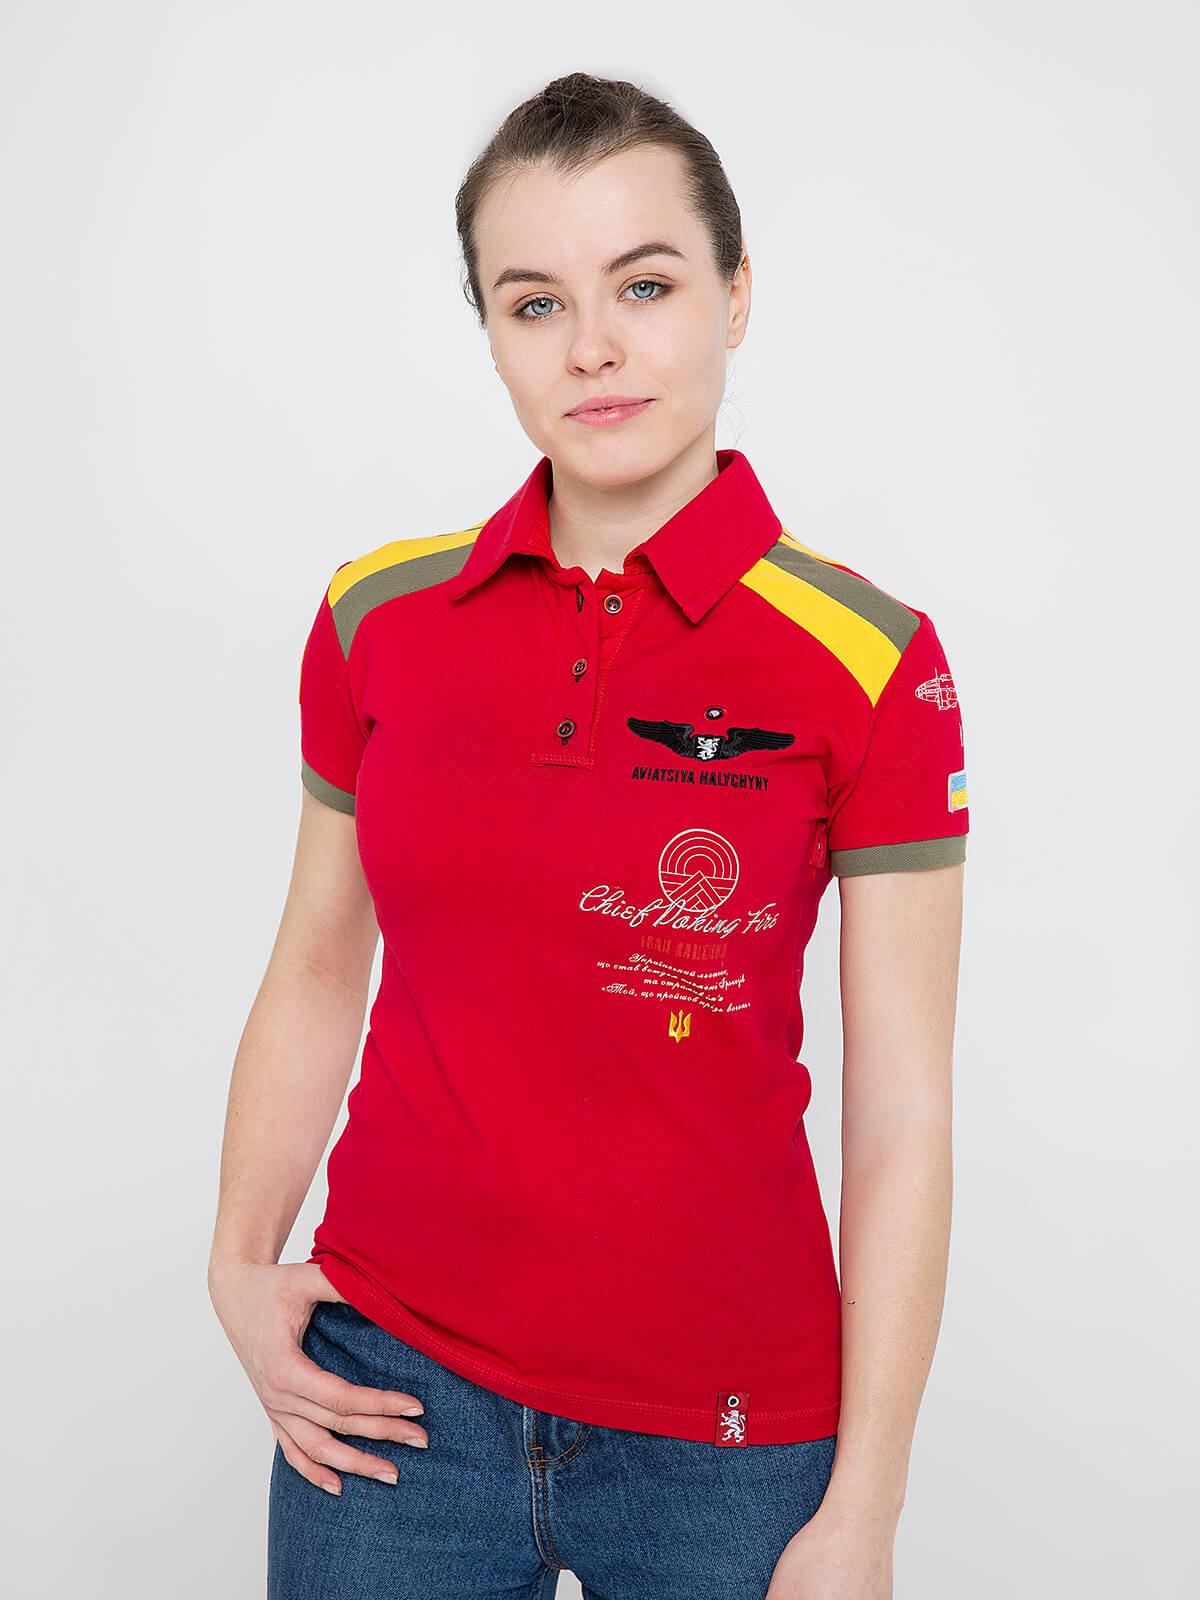 Women's Polo Shirt Indian. Color red. Pique fabric: 100% cotton.